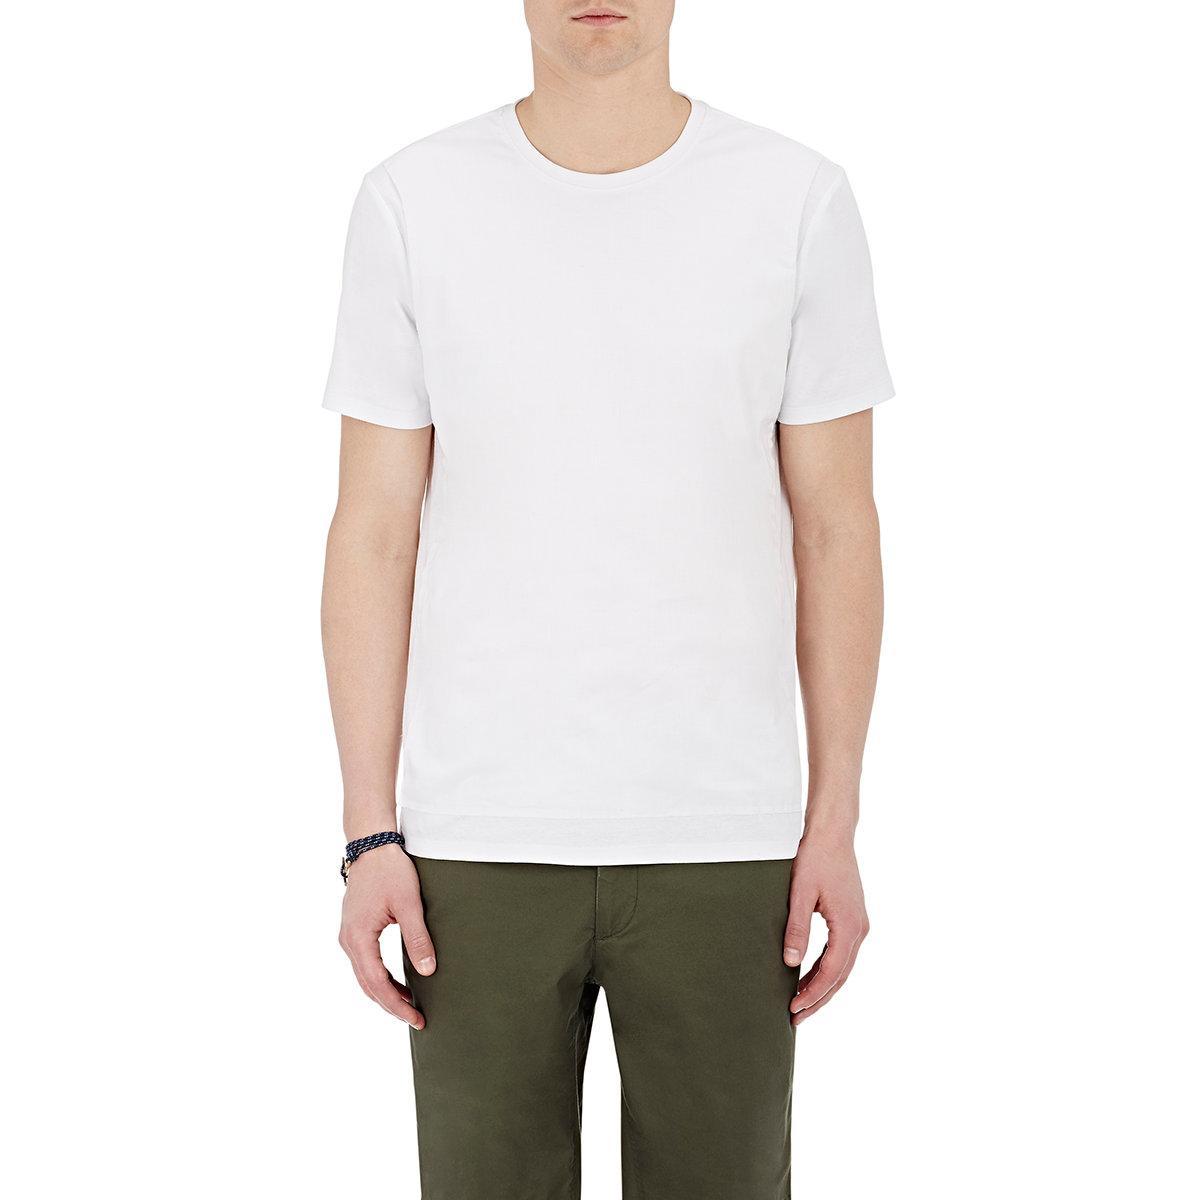 Atm gauze front t in white for men lyst for Atm t shirt sale